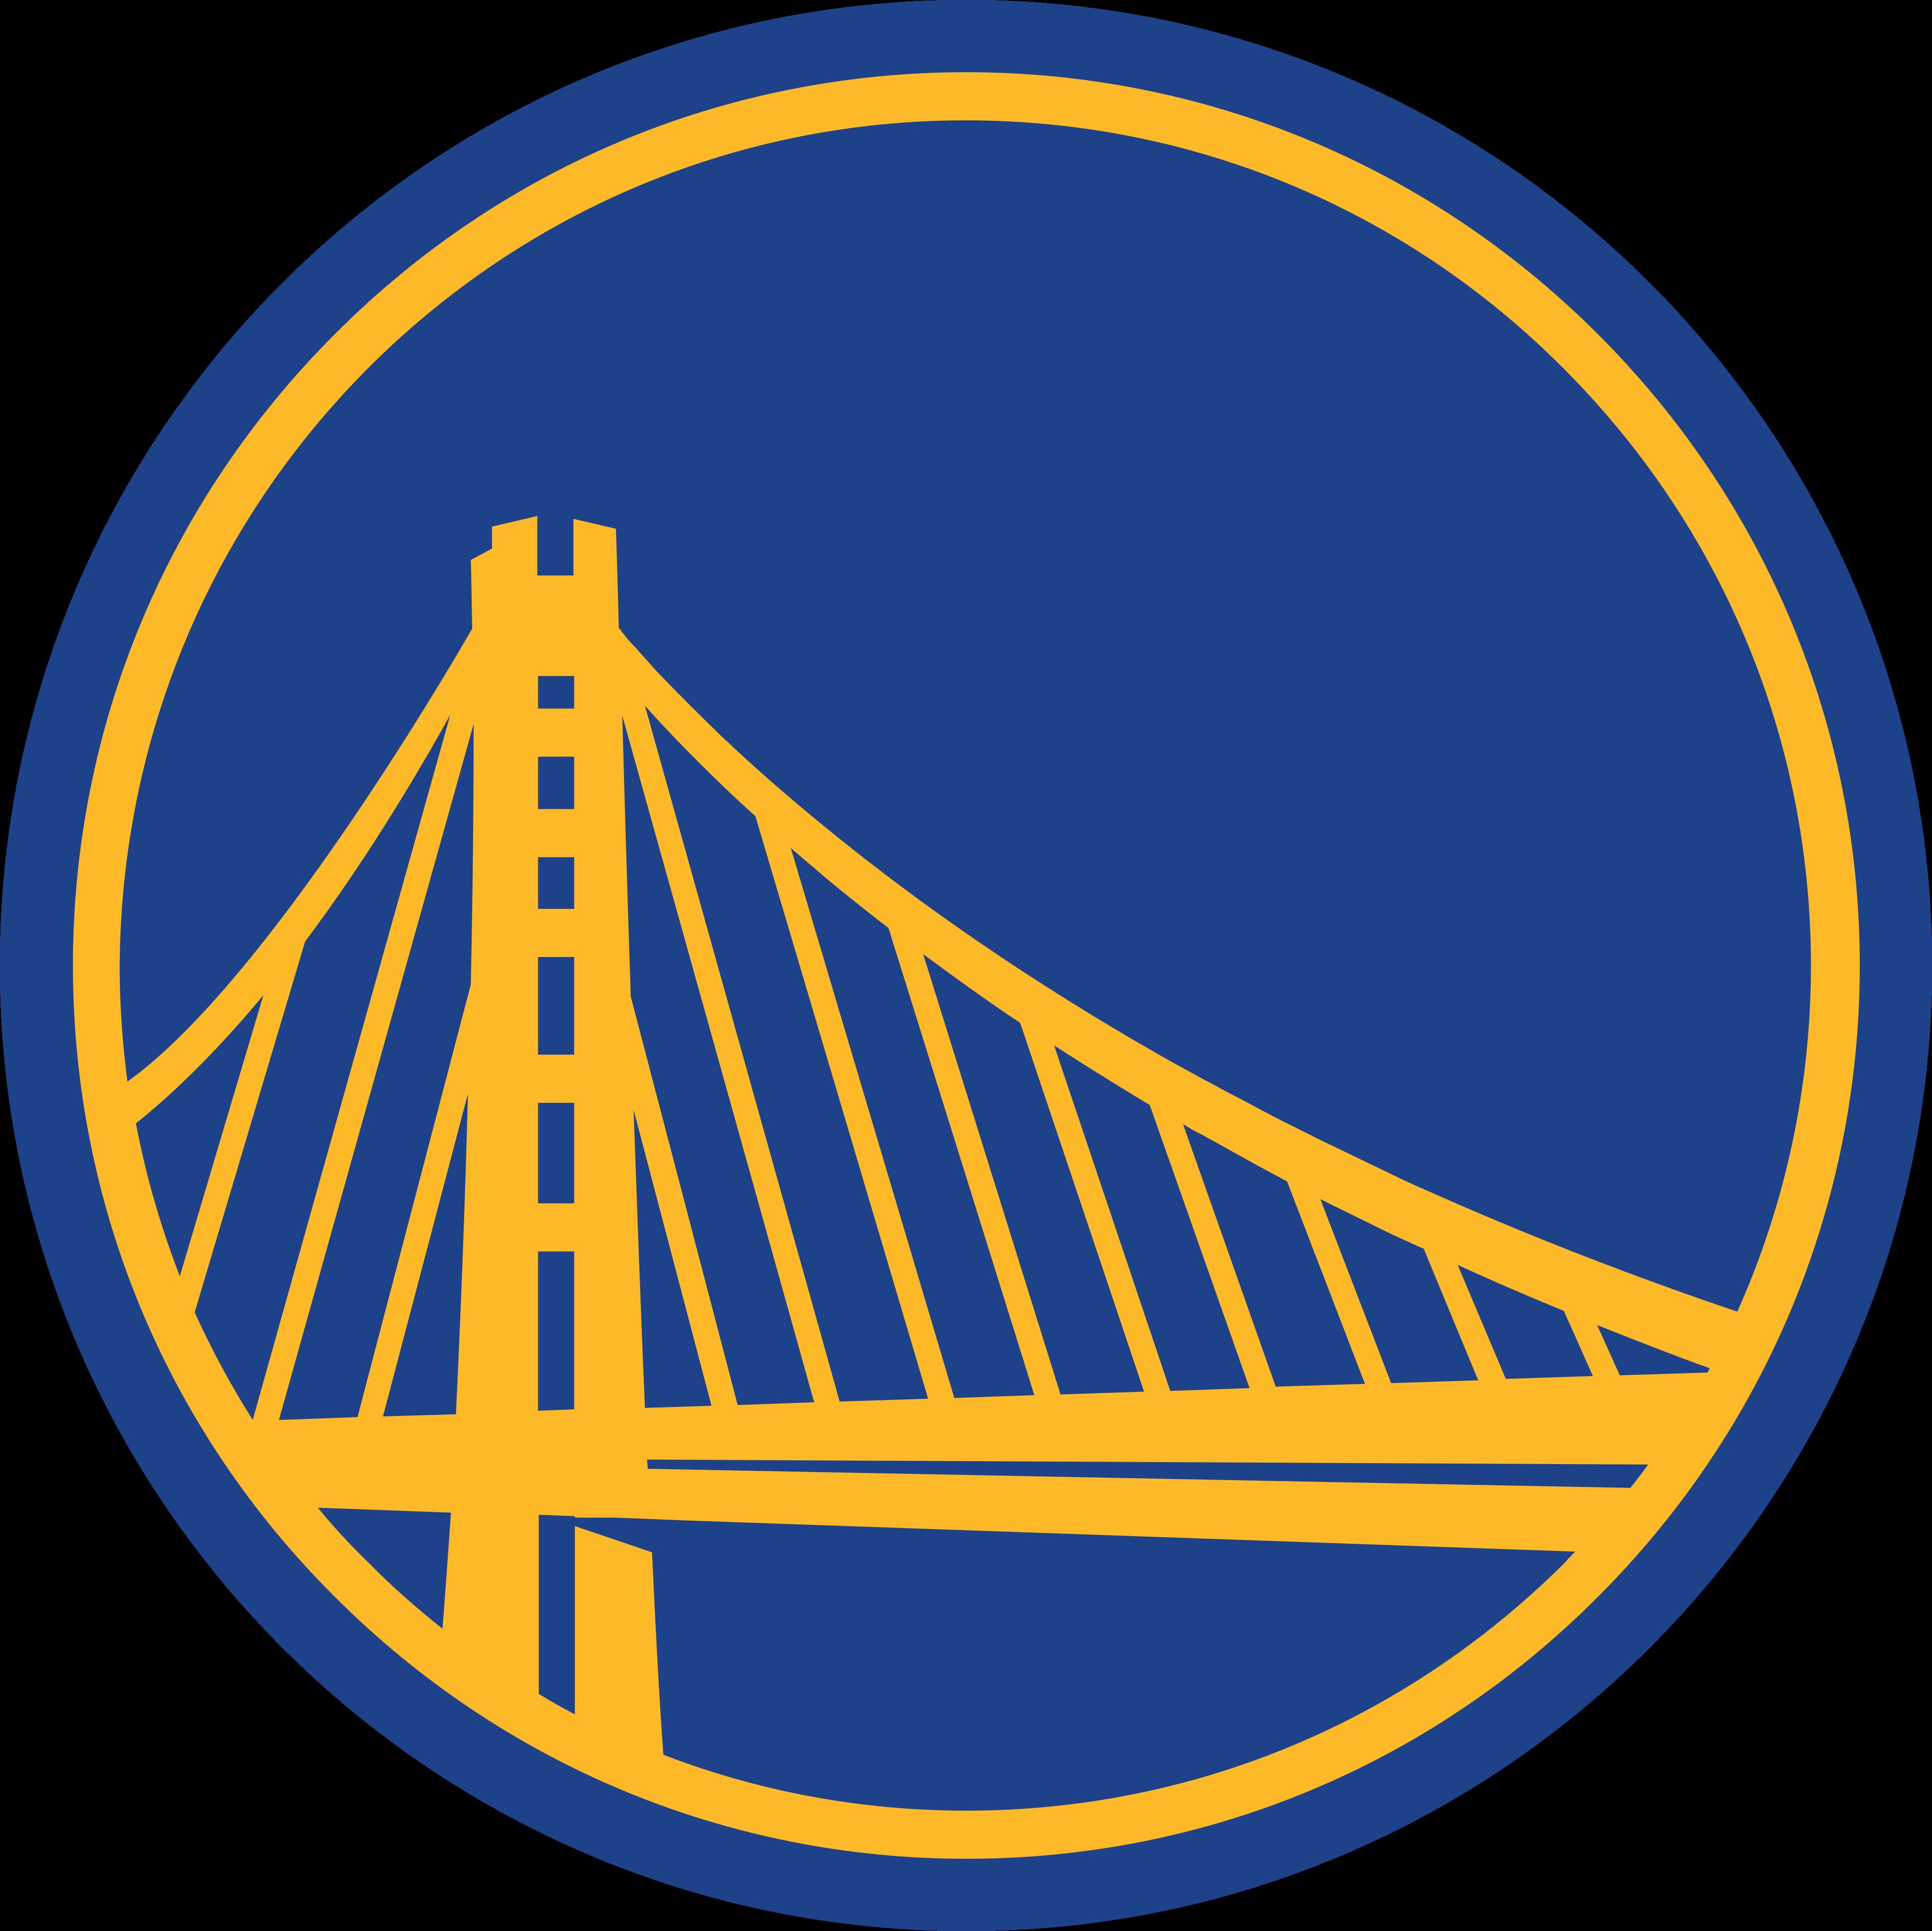 golden state warriors logo 8 - Golden State Warriors Logo